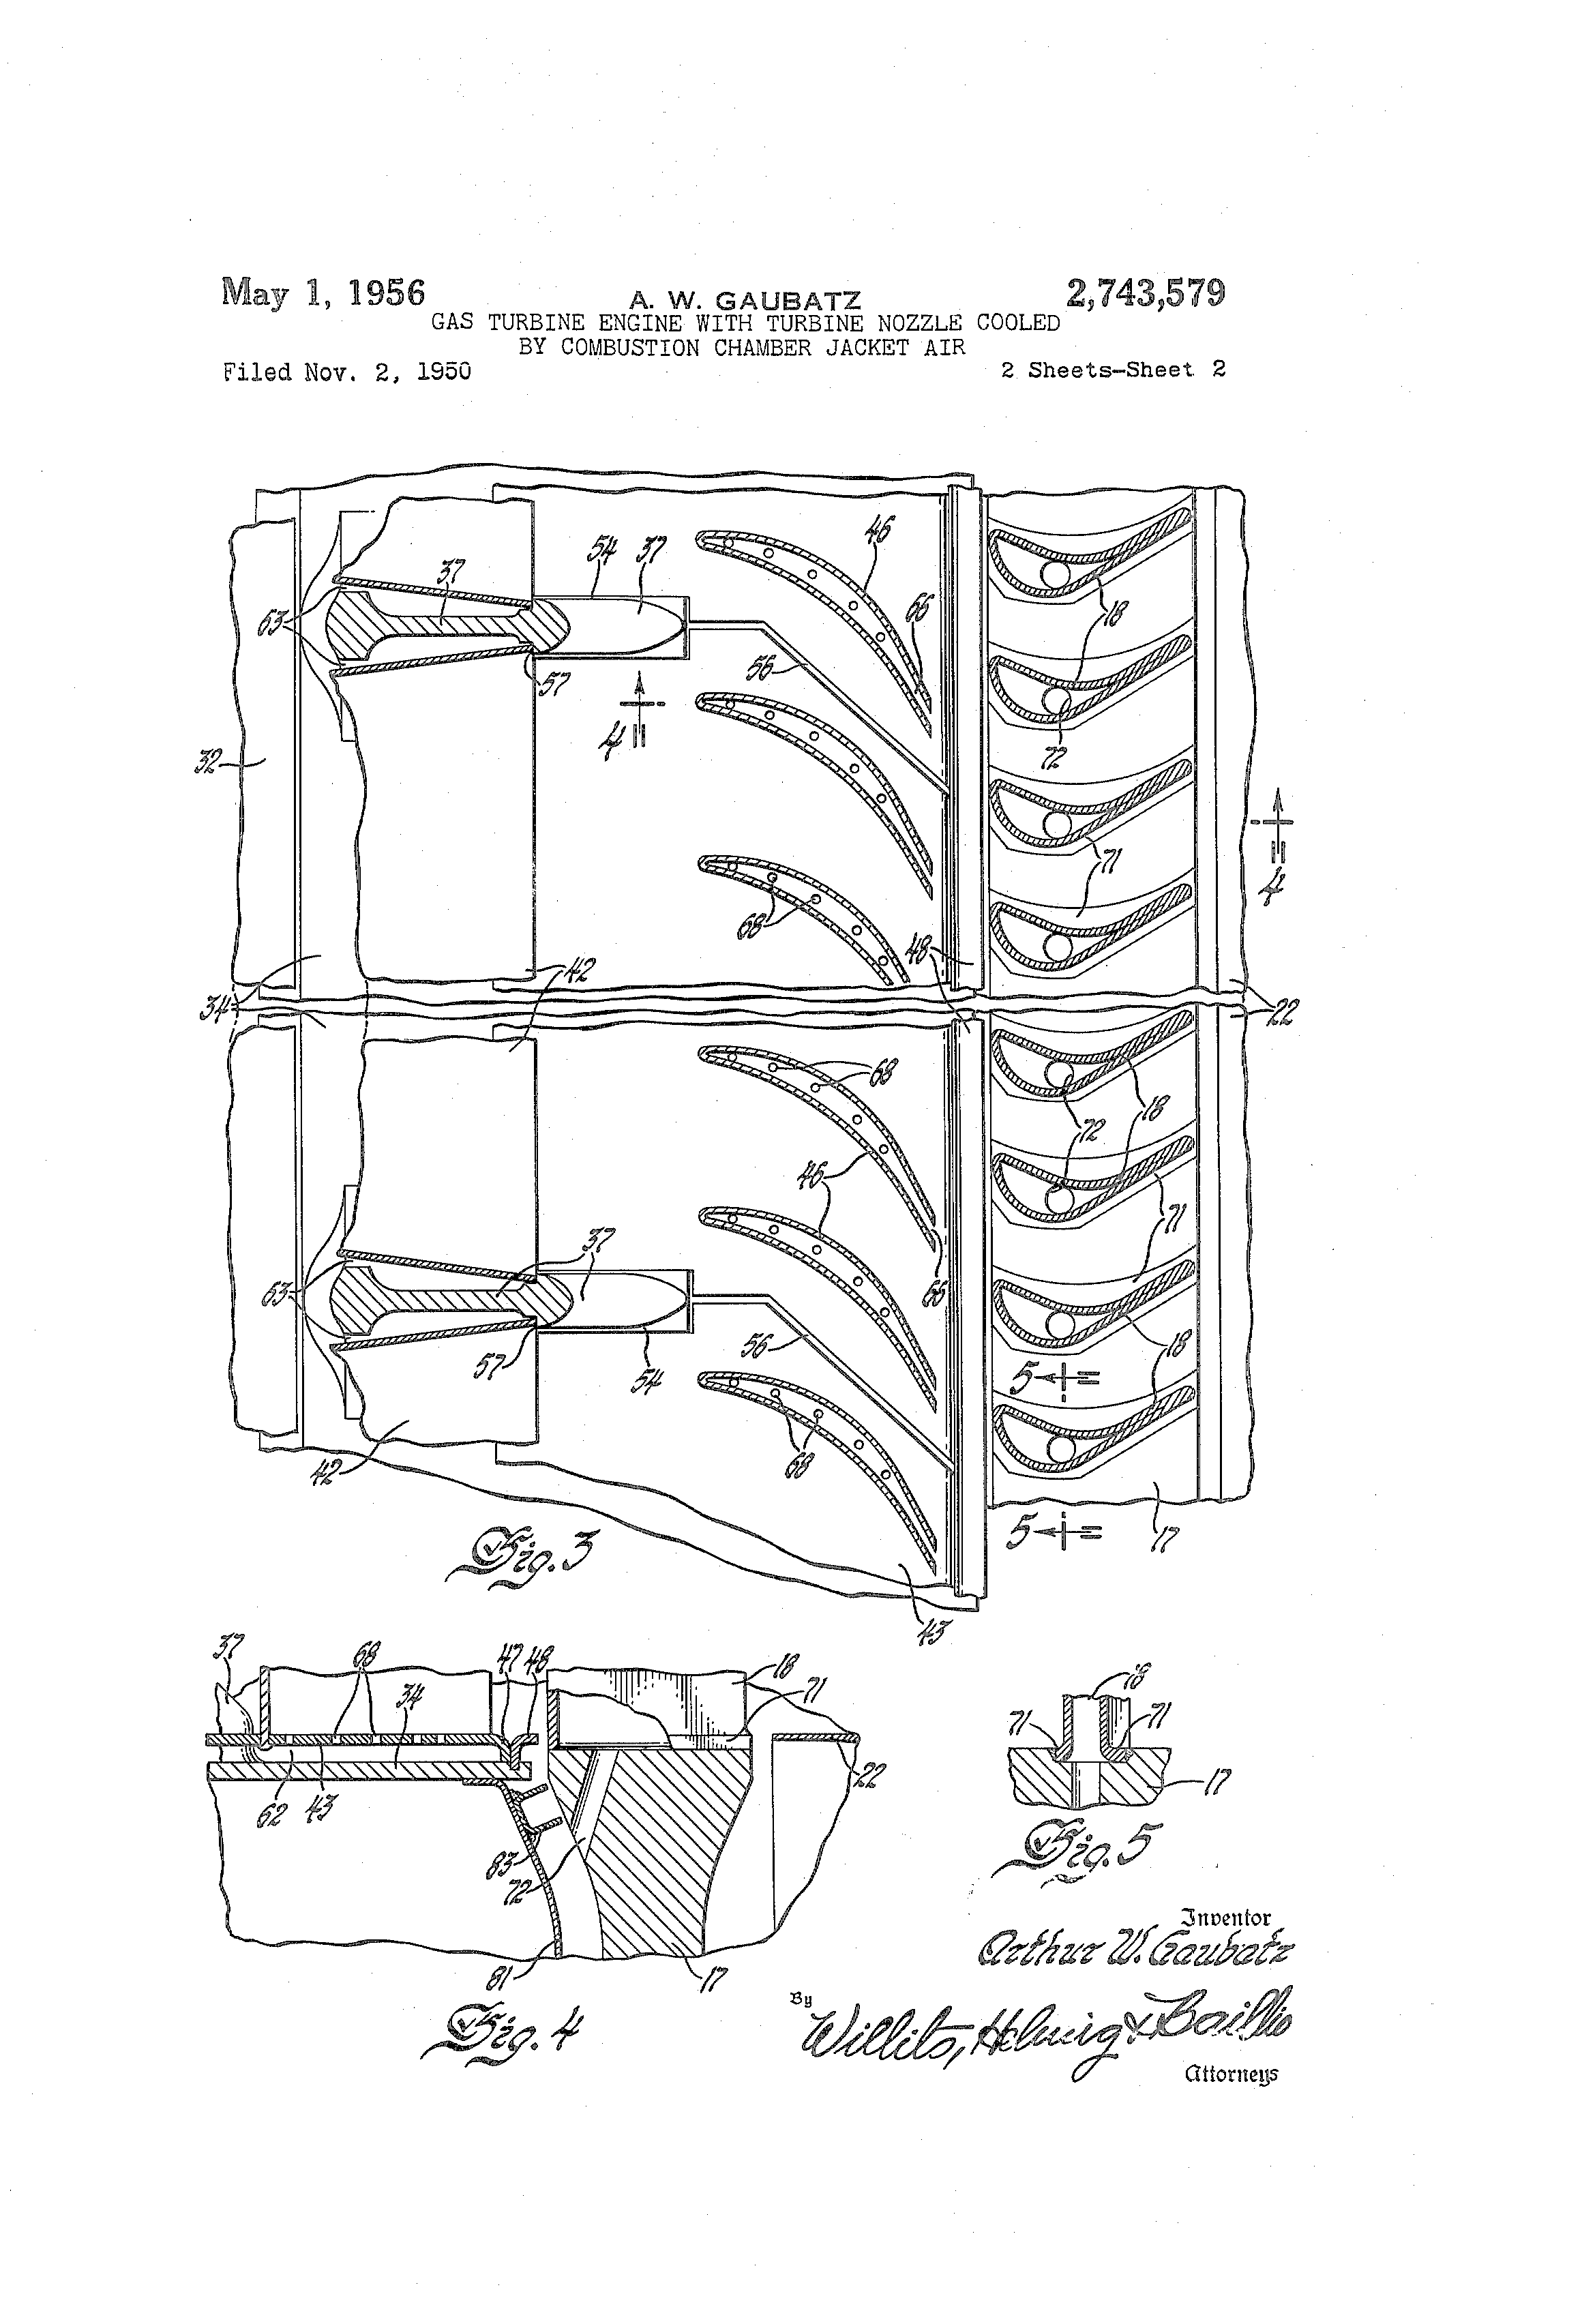 Patente US Gas turbine engine with turbine nozzle cooled